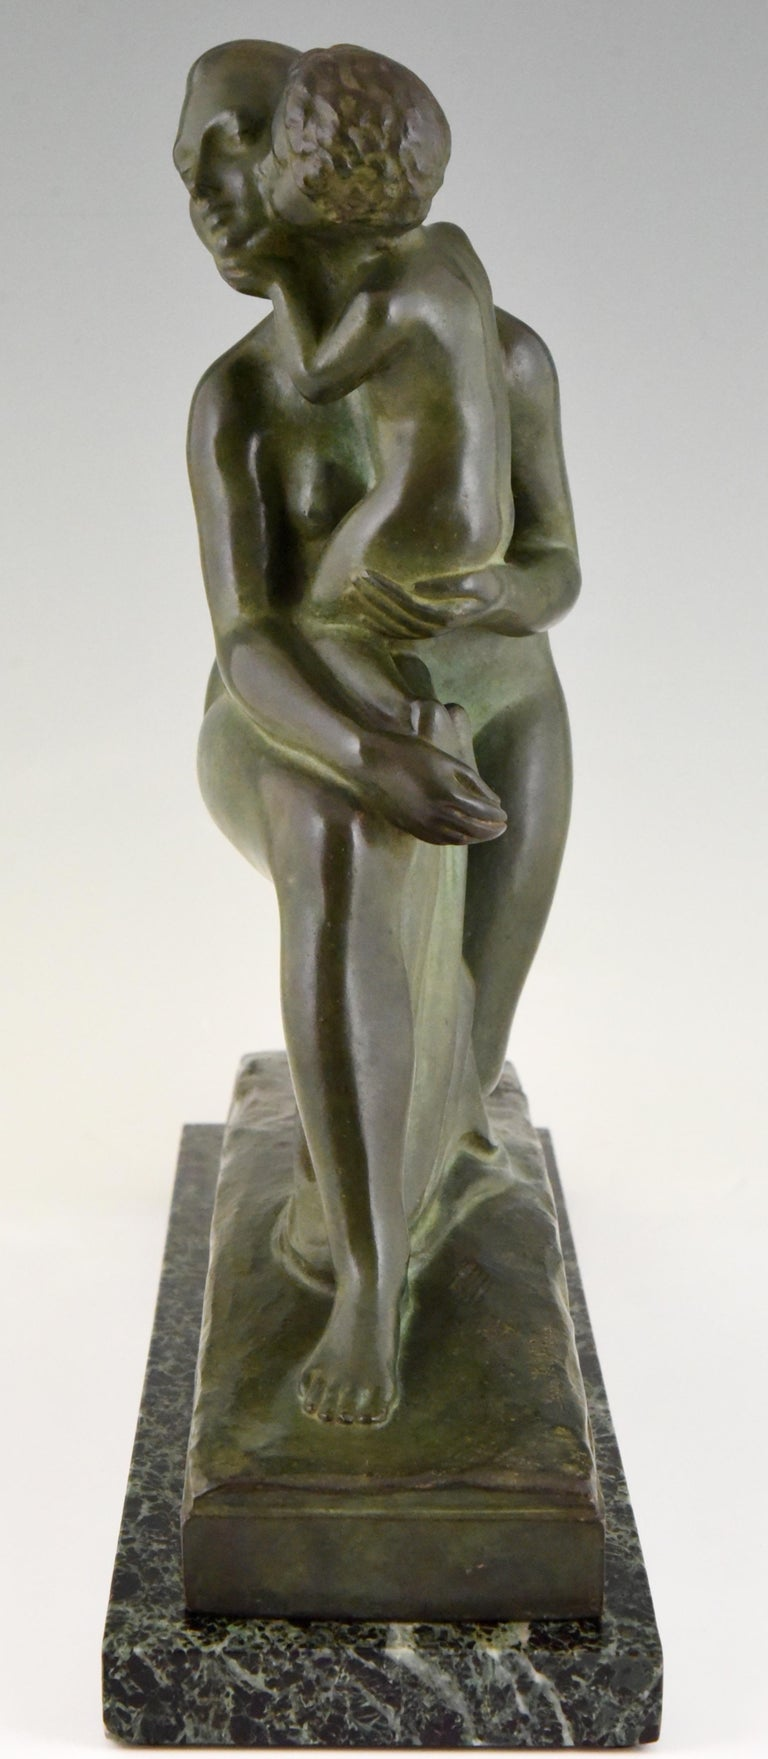 Patinated Art Deco Bronze Sculpture Mother and Child Motherhood André Huguenin Dumittan For Sale